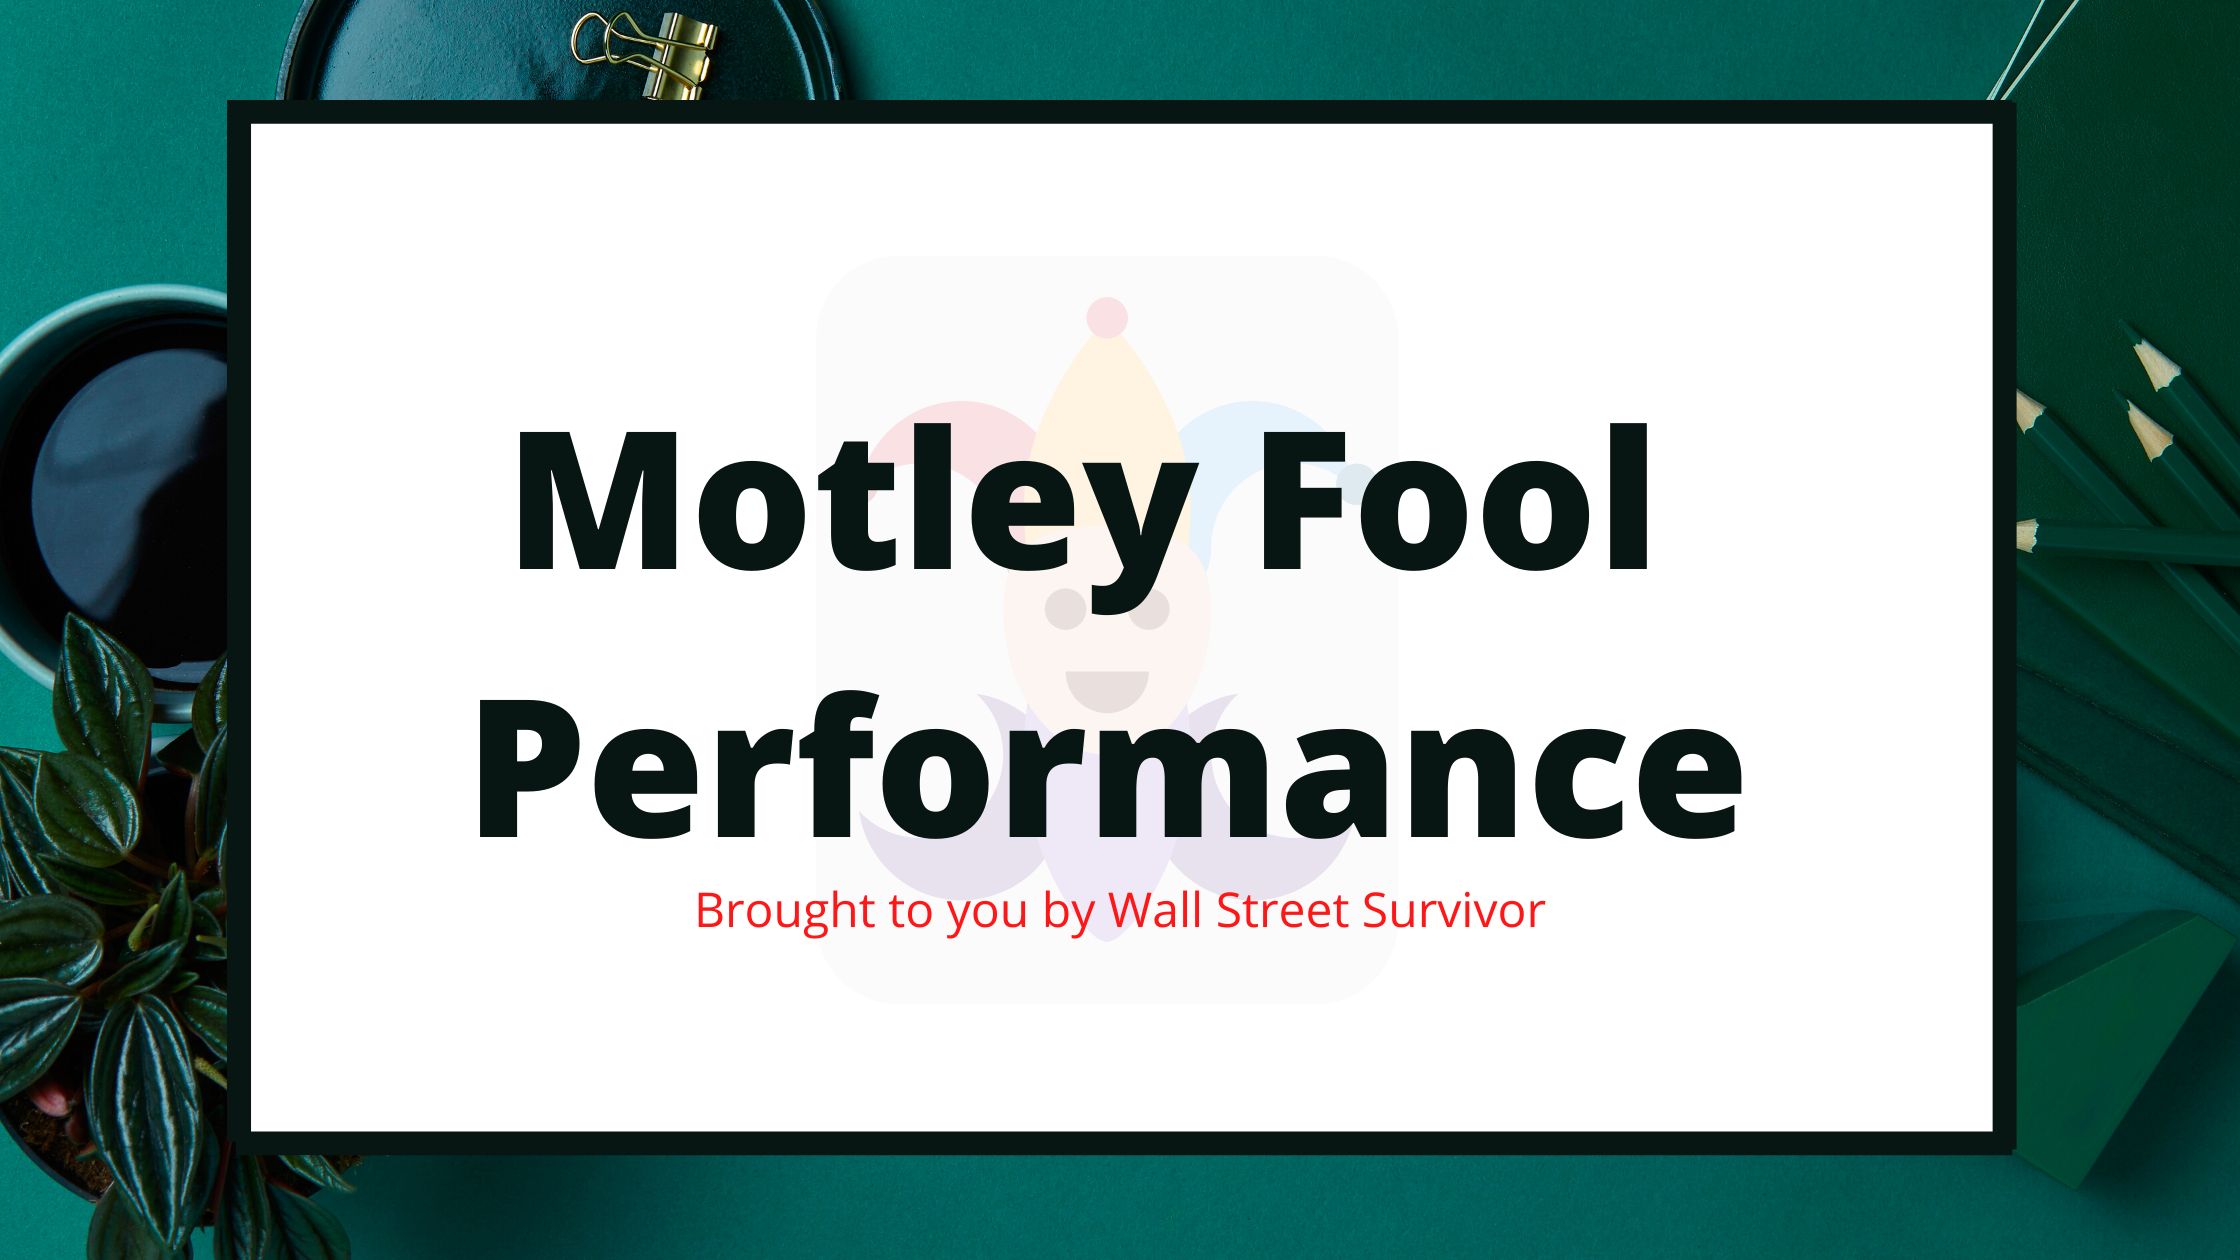 Motley Fool Performance